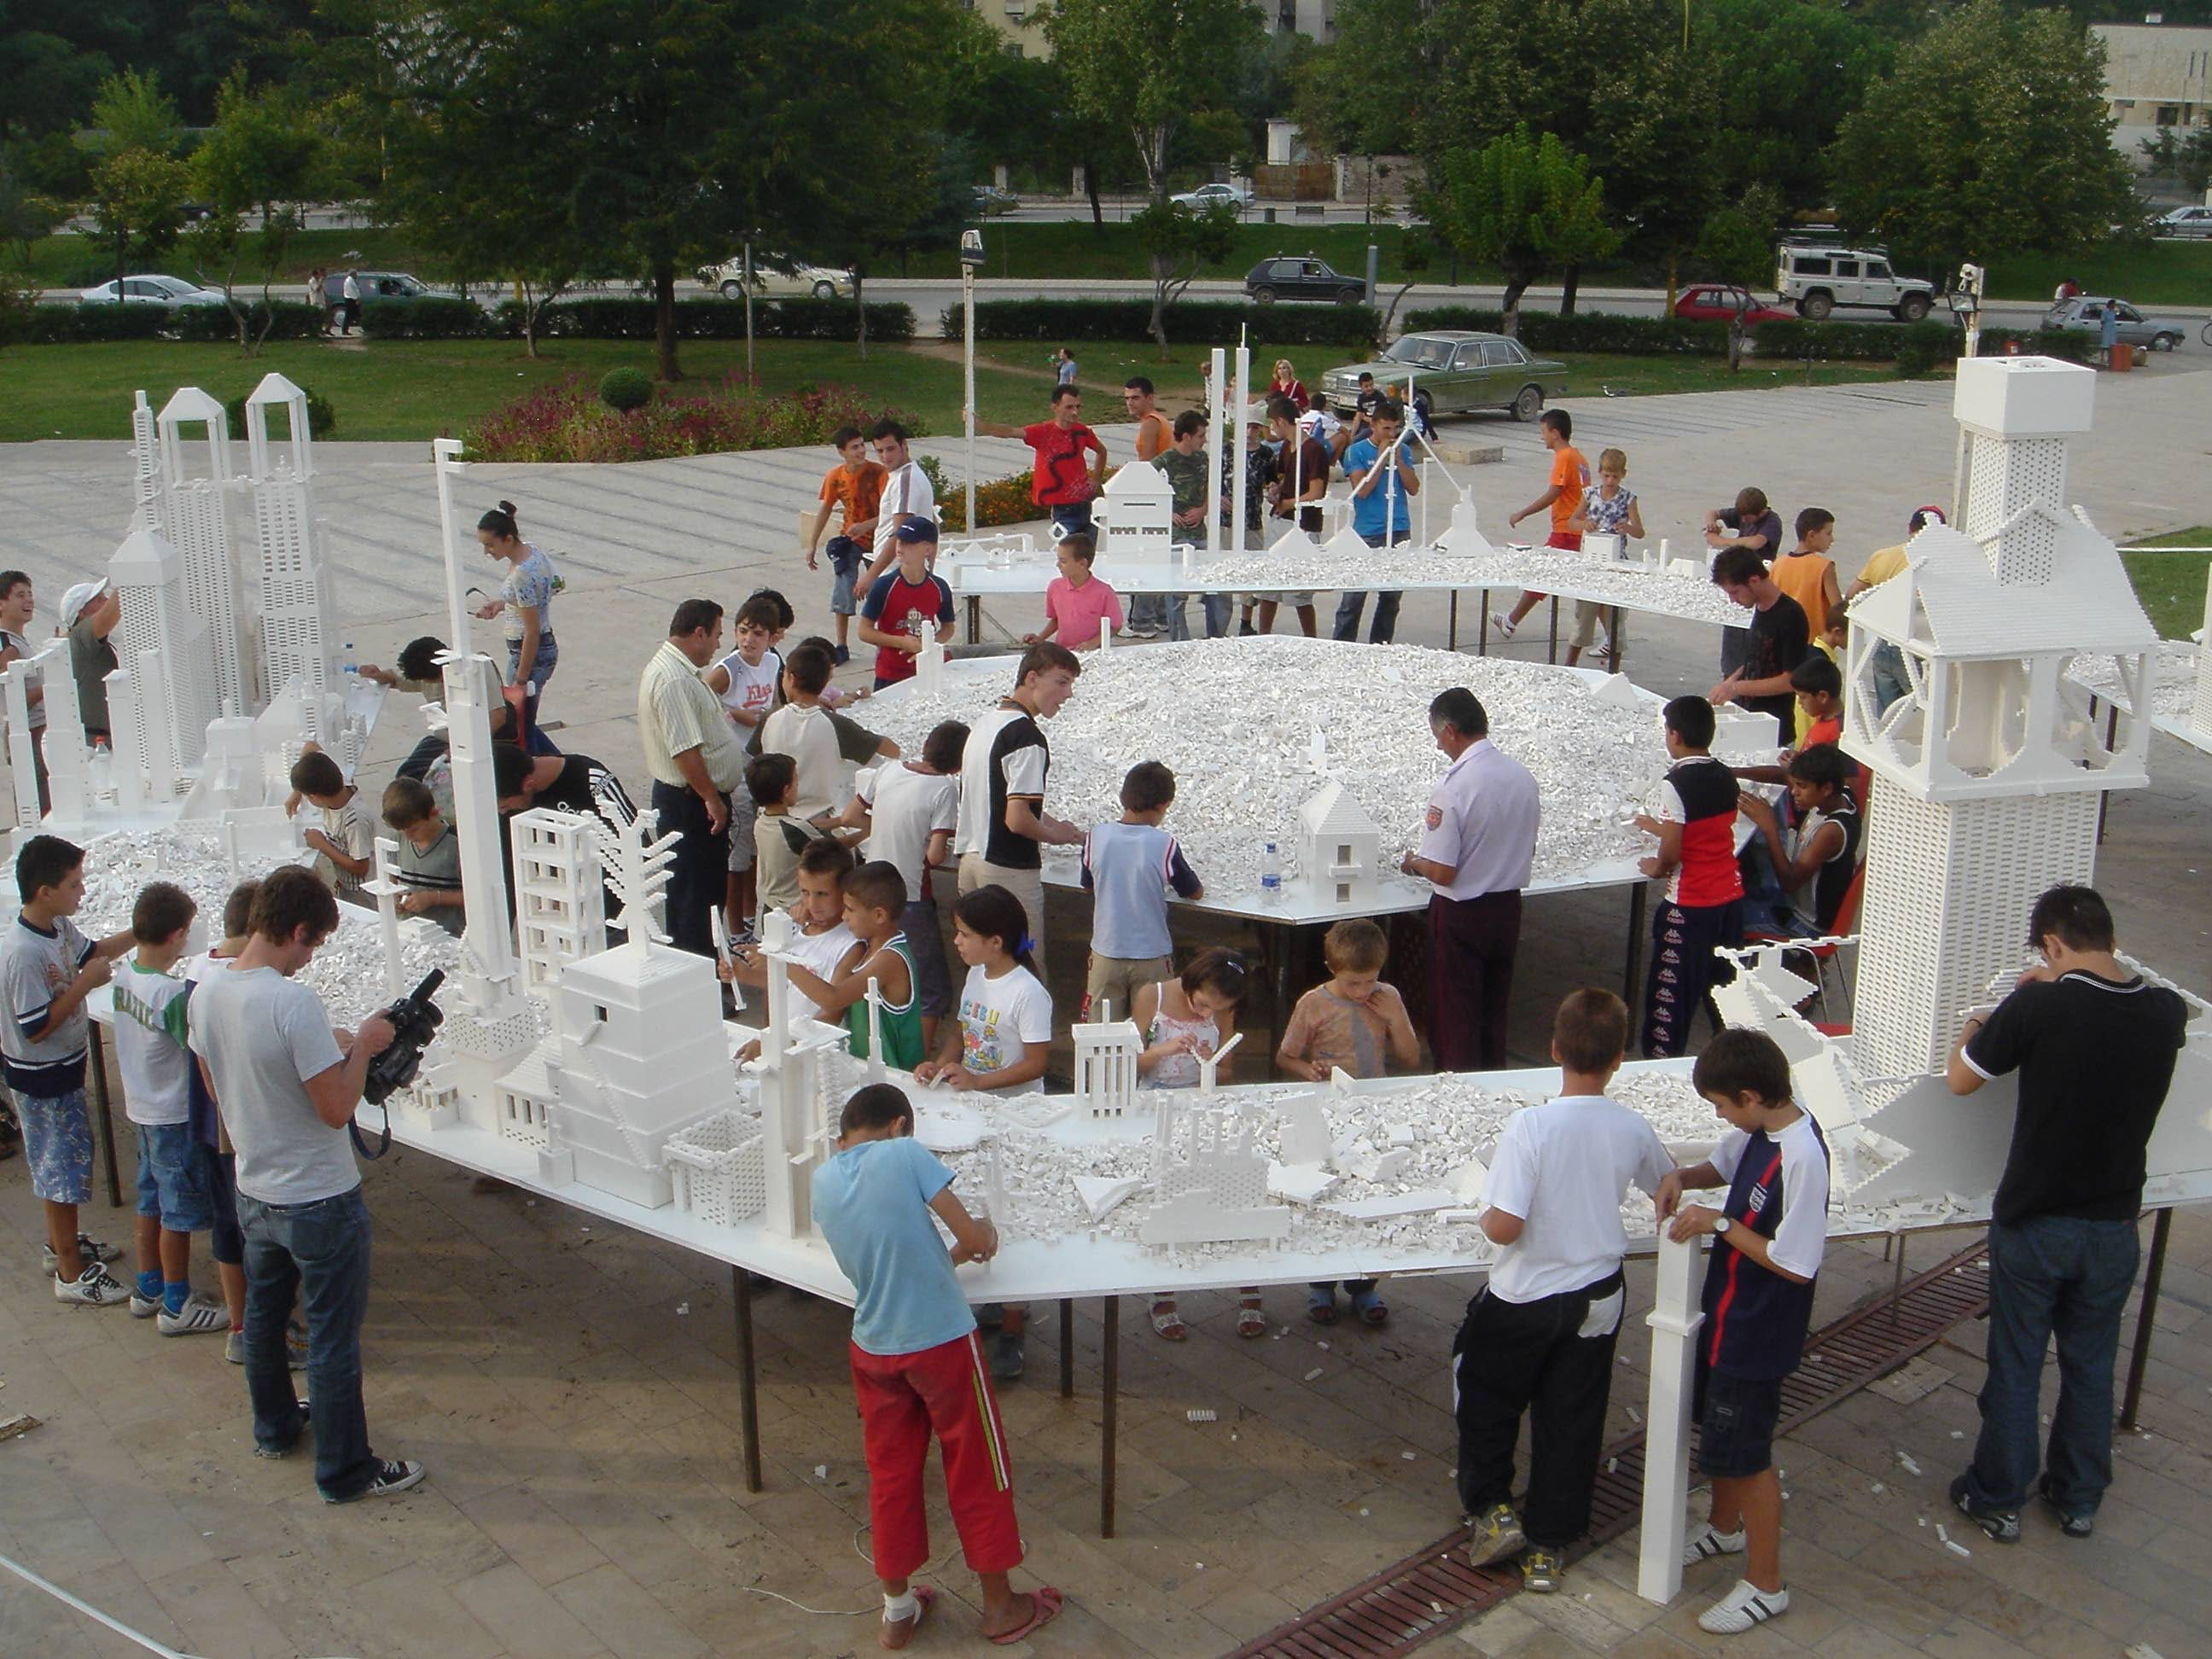 Olafur Eliasson The collectivity project, 2005 White LEGO bricks, wood 3rd Tirana Biennale, Albania, 2005 Photo: Olafur Eliasson Courtesy of the artist; neugerriemschneider, Berlin; Tanya Bonakdar Gallery, New York / Los Angeles © 2005 Olafur Eliasson